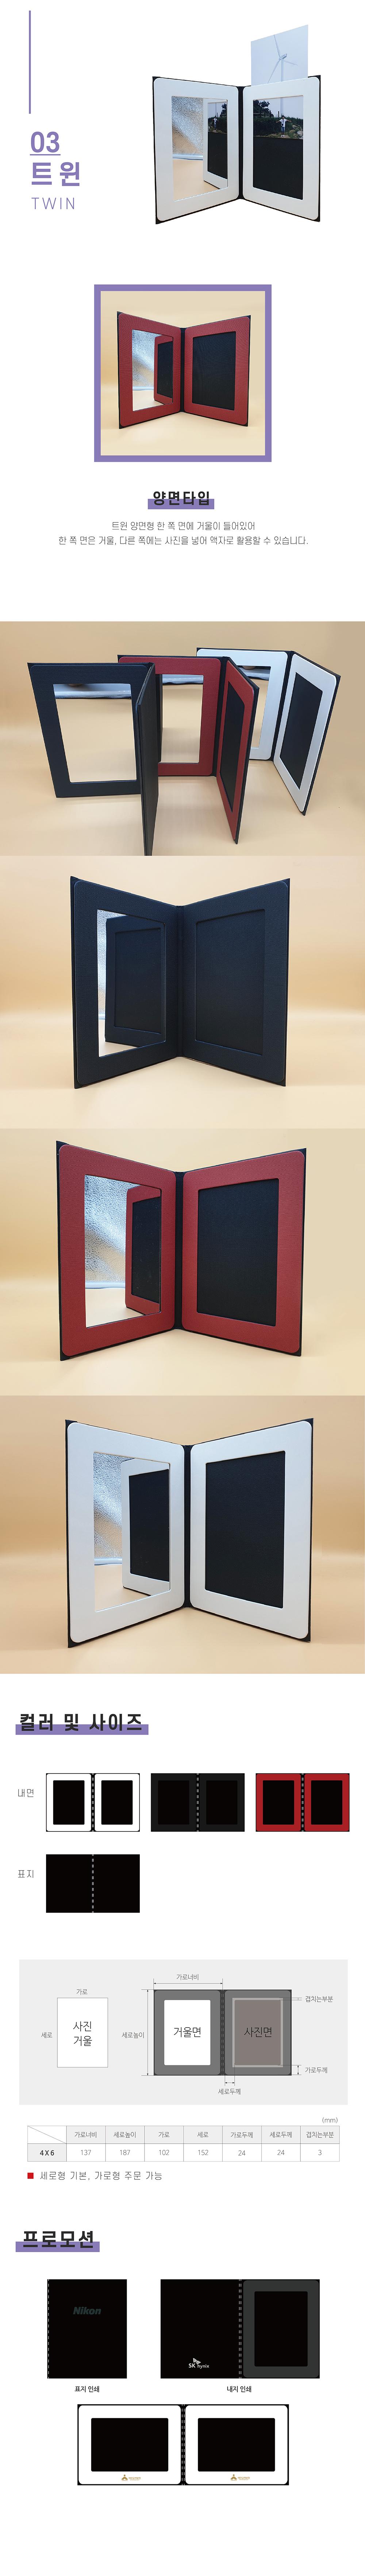 mirrorandframe5